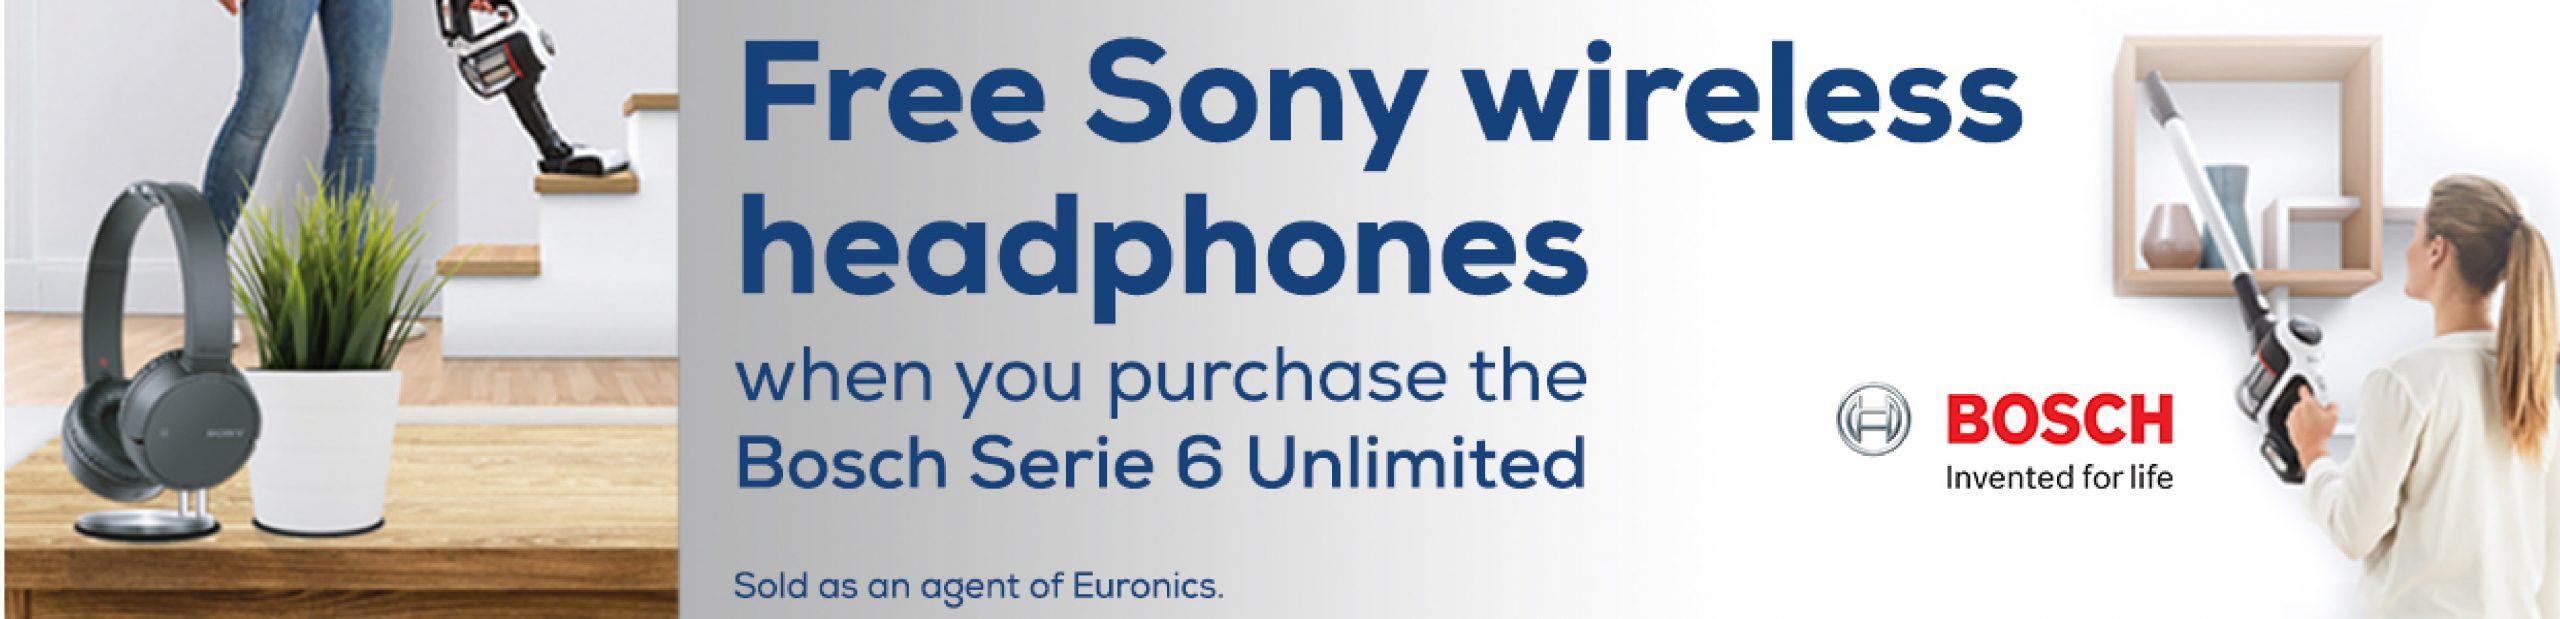 Free Sony Wireless Headphones - Bosch